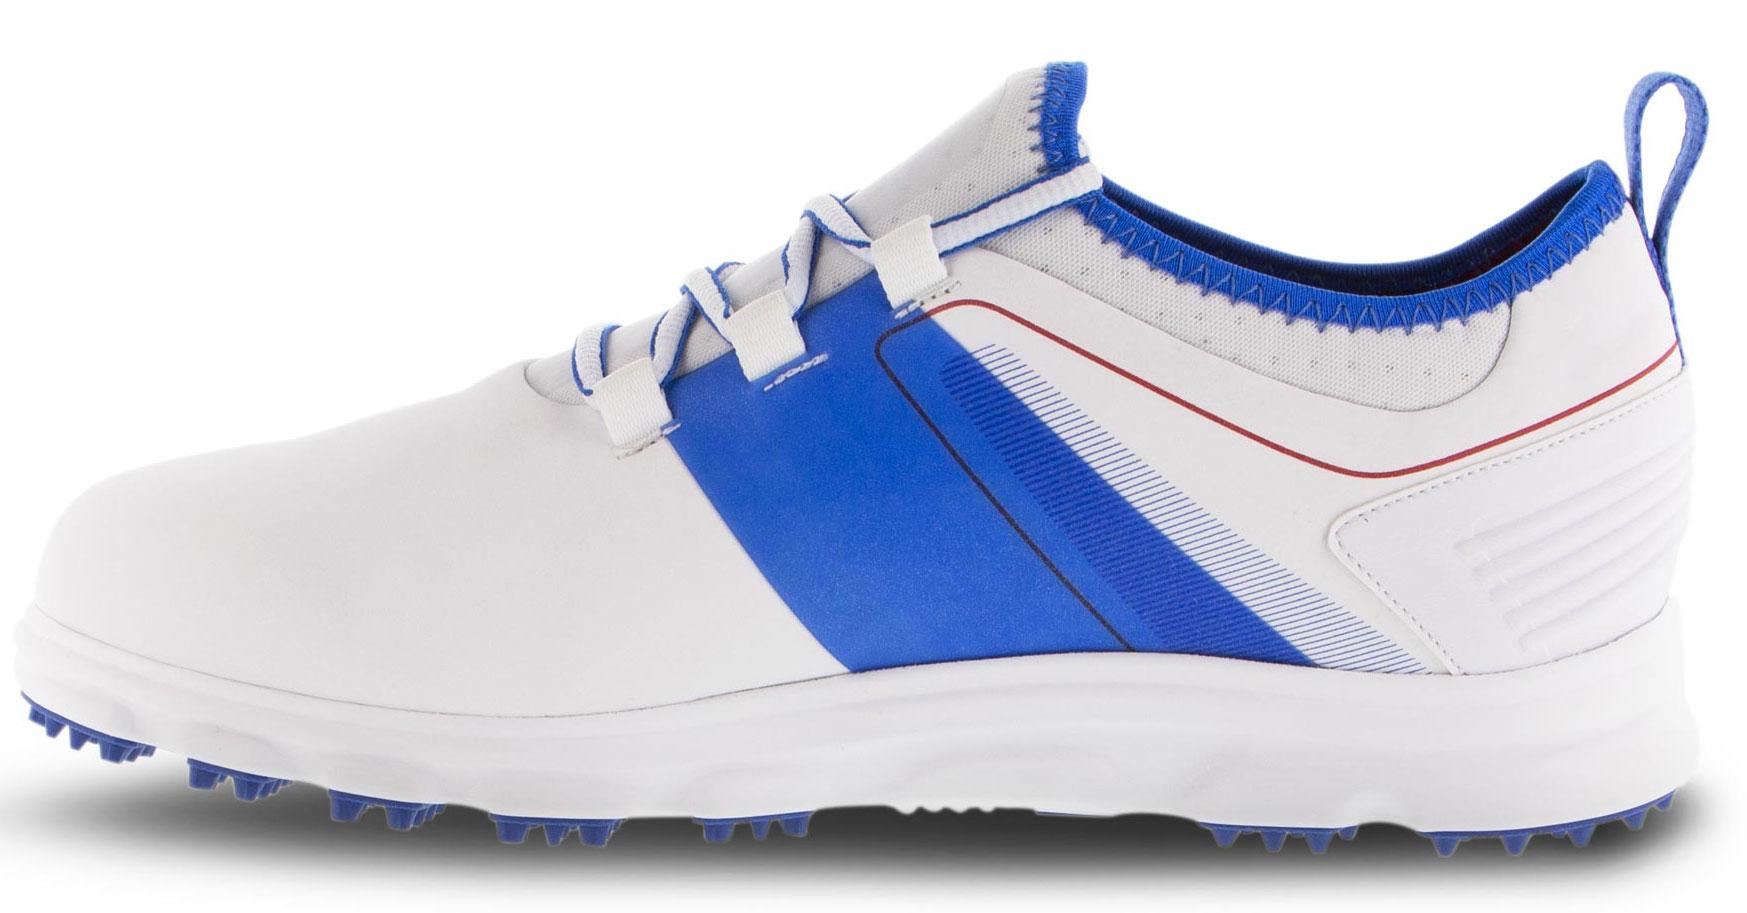 FootJoy-Superlites-XP-Golf-Shoes-Men-039-s-New thumbnail 12